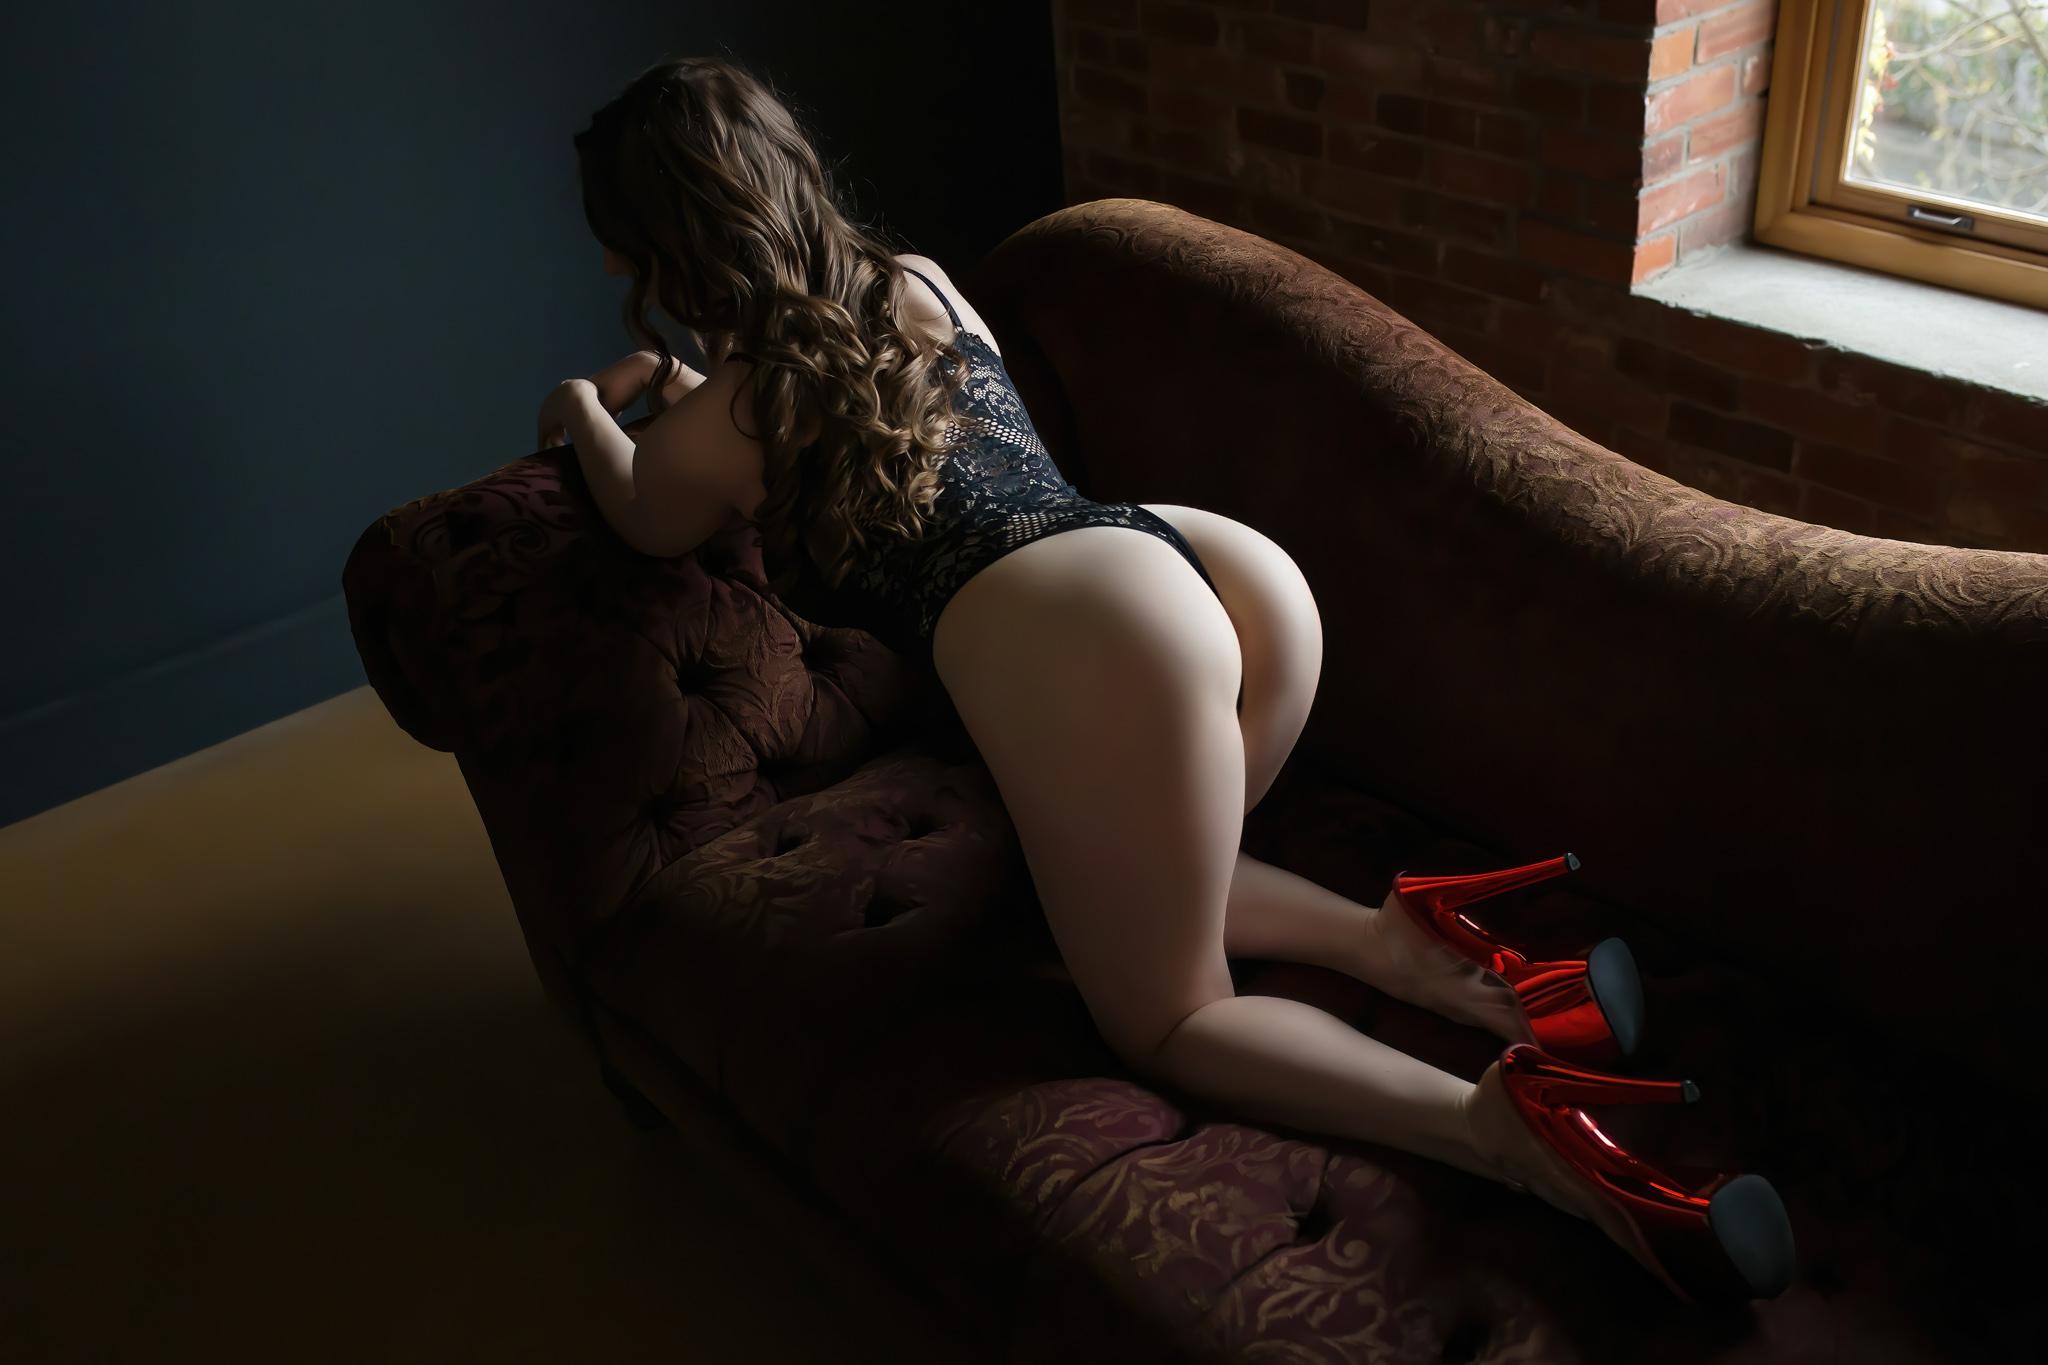 Woman posing for boudoir shoot wearing red heels.